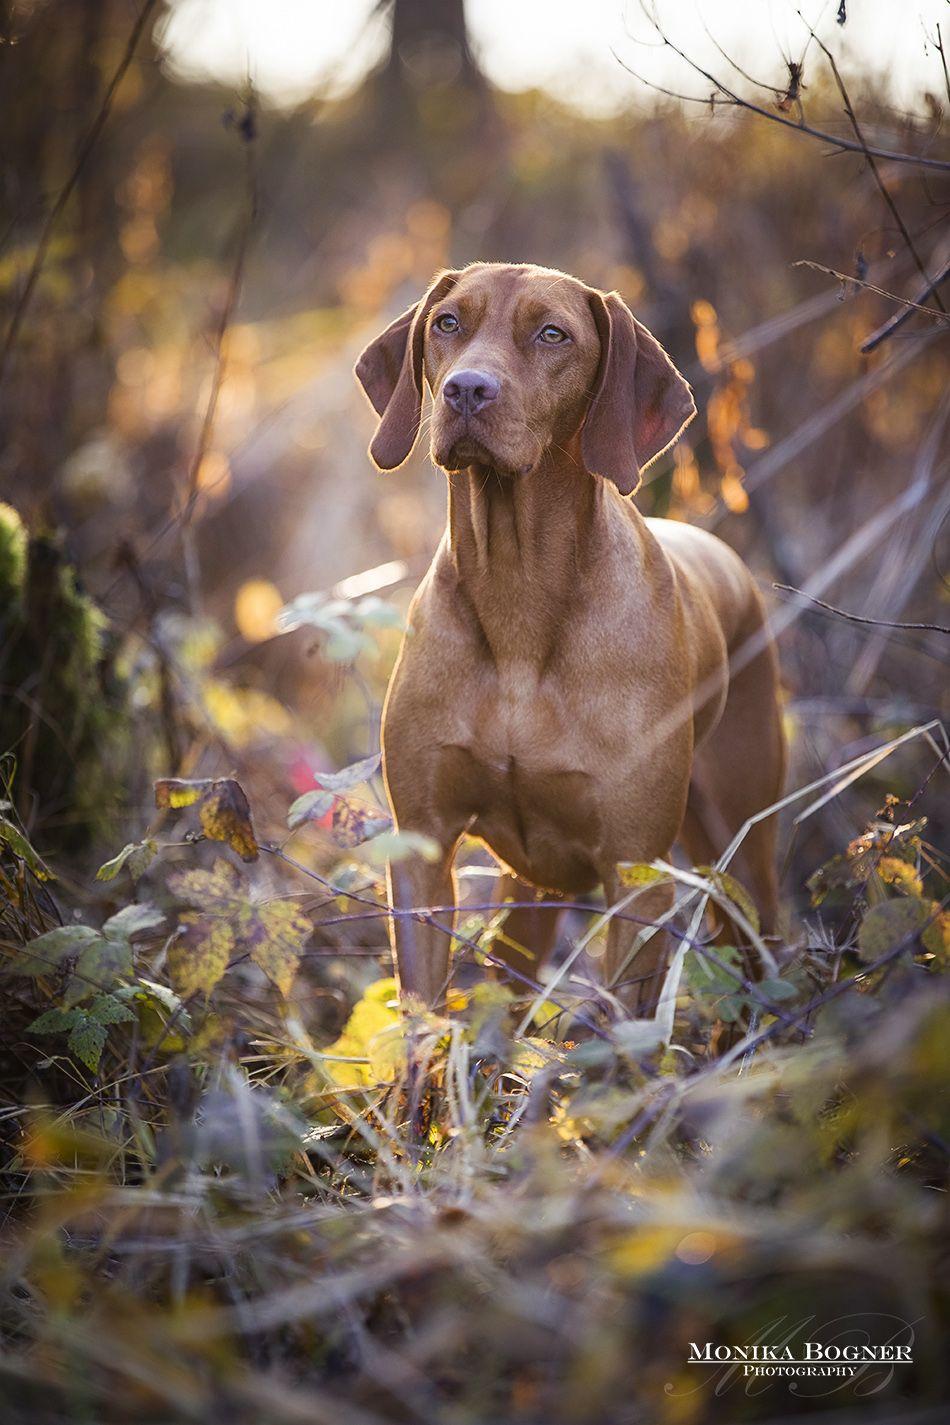 Magyar Vizsla Hunde In Der Natur Hundefotografie Monika Bogner Photography Pferdefotografie Und Hundefotografie In B Vizsla Hund Hundefotografie Vizsla